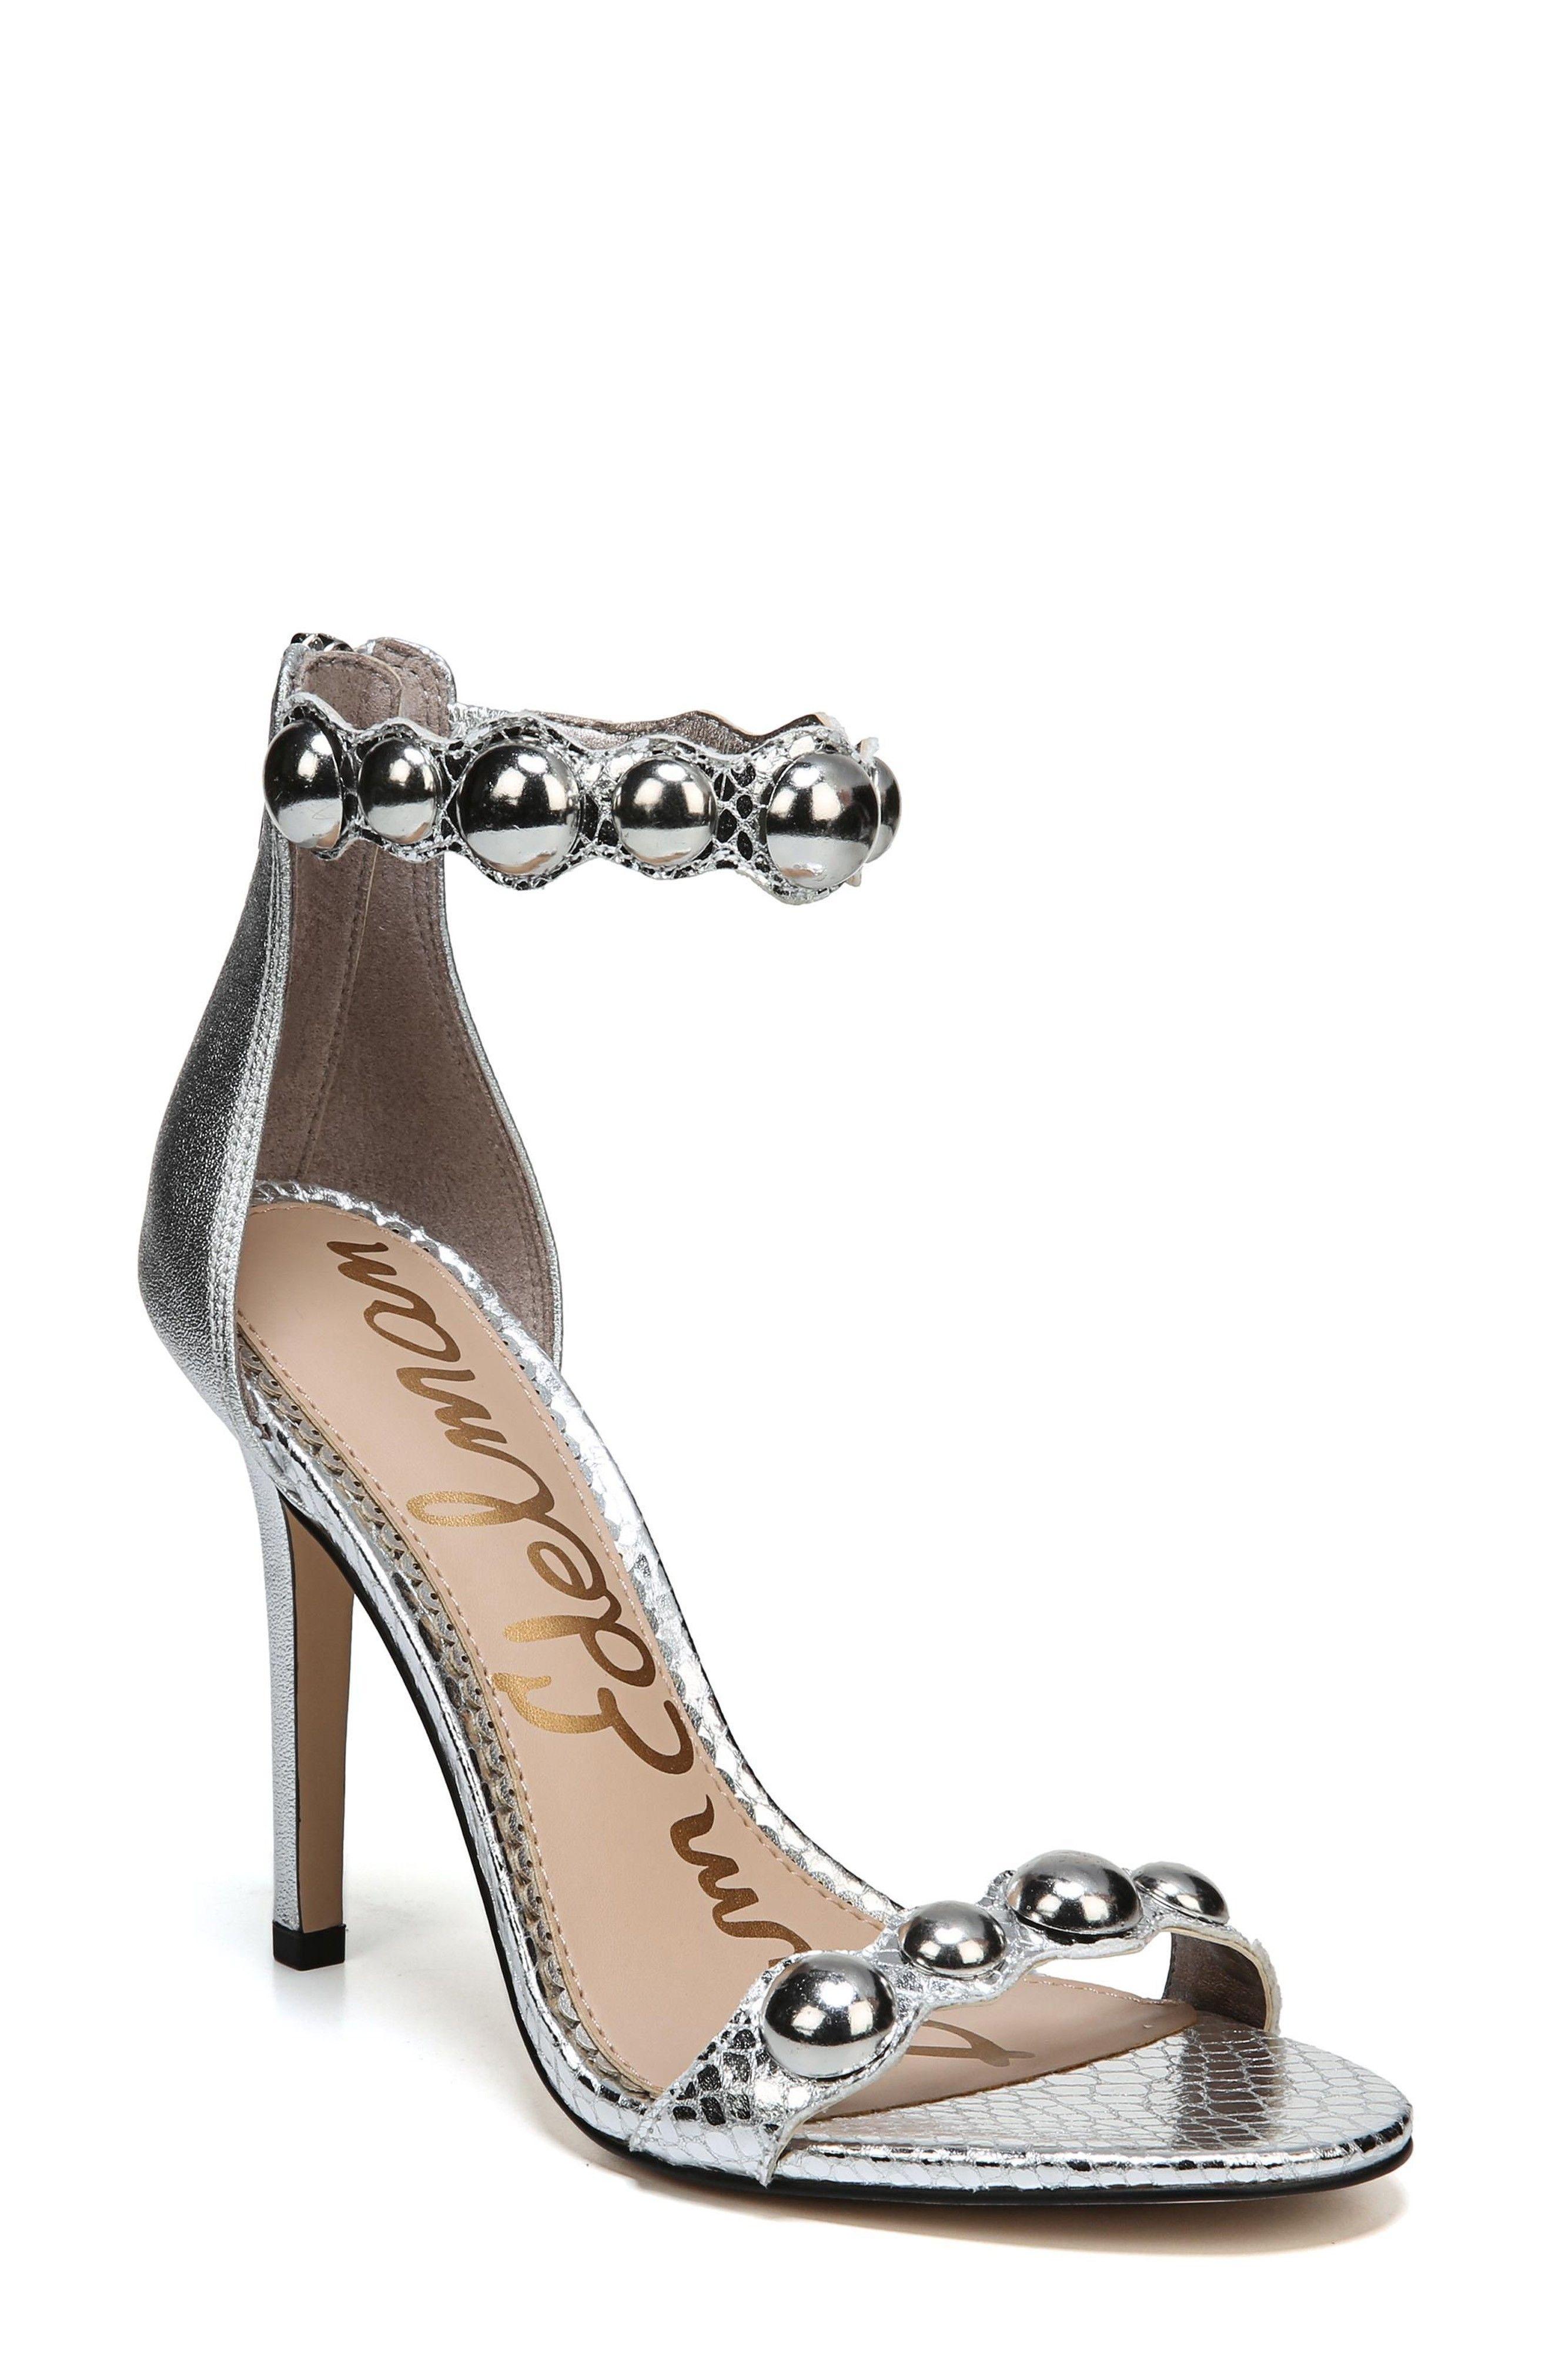 e3cb0bf08590 Buy SAM EDELMAN Sam Edelmen Addison Embellished Ankle Strap Sandal online.  New SAM EDELMAN Sandals.   119.95  SKU WHEX58456QGBE98746